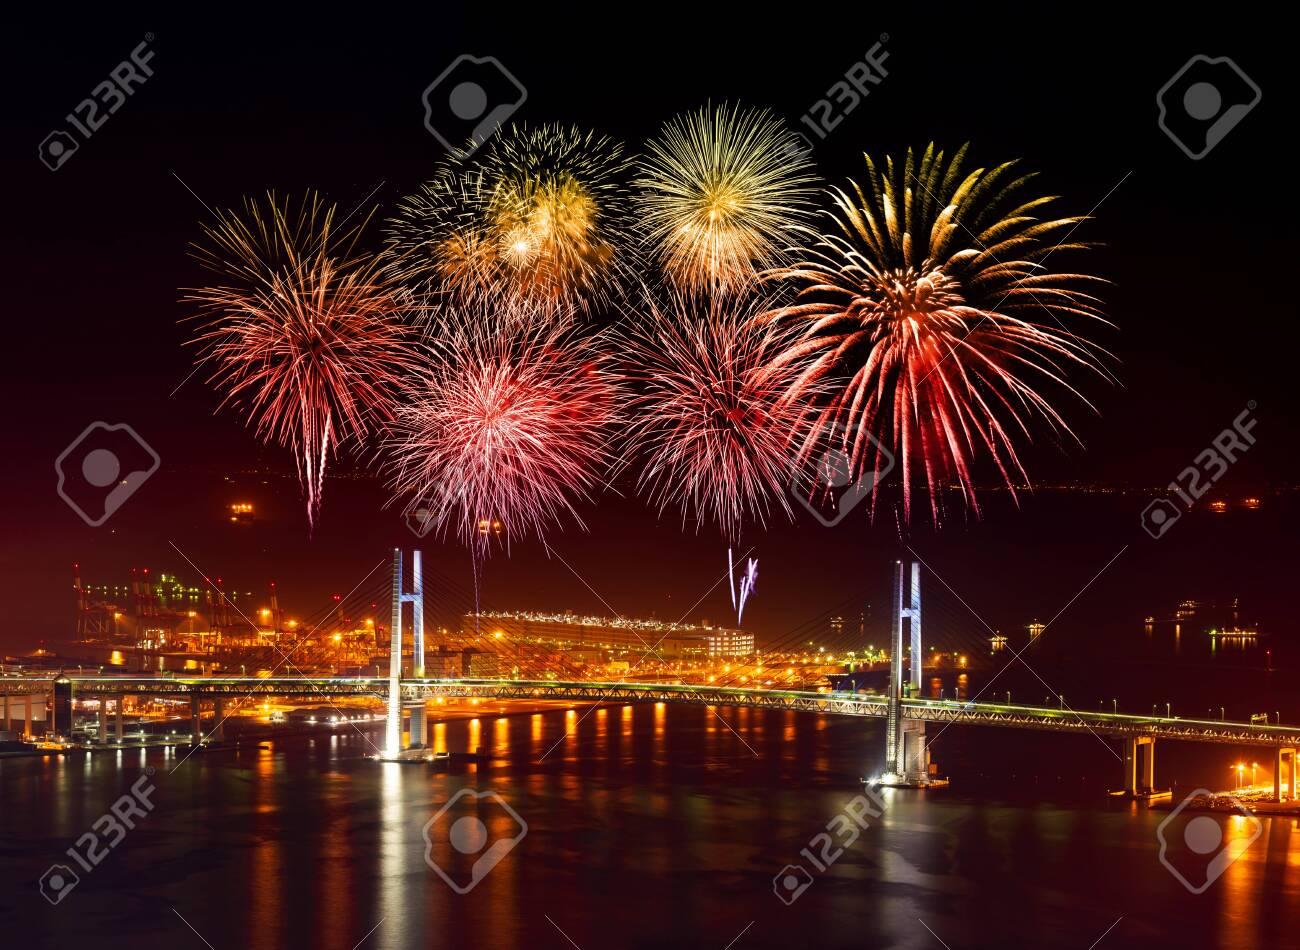 Fireworks celebrating over Yokohama Bay Bridge at night, Japan - 131648006